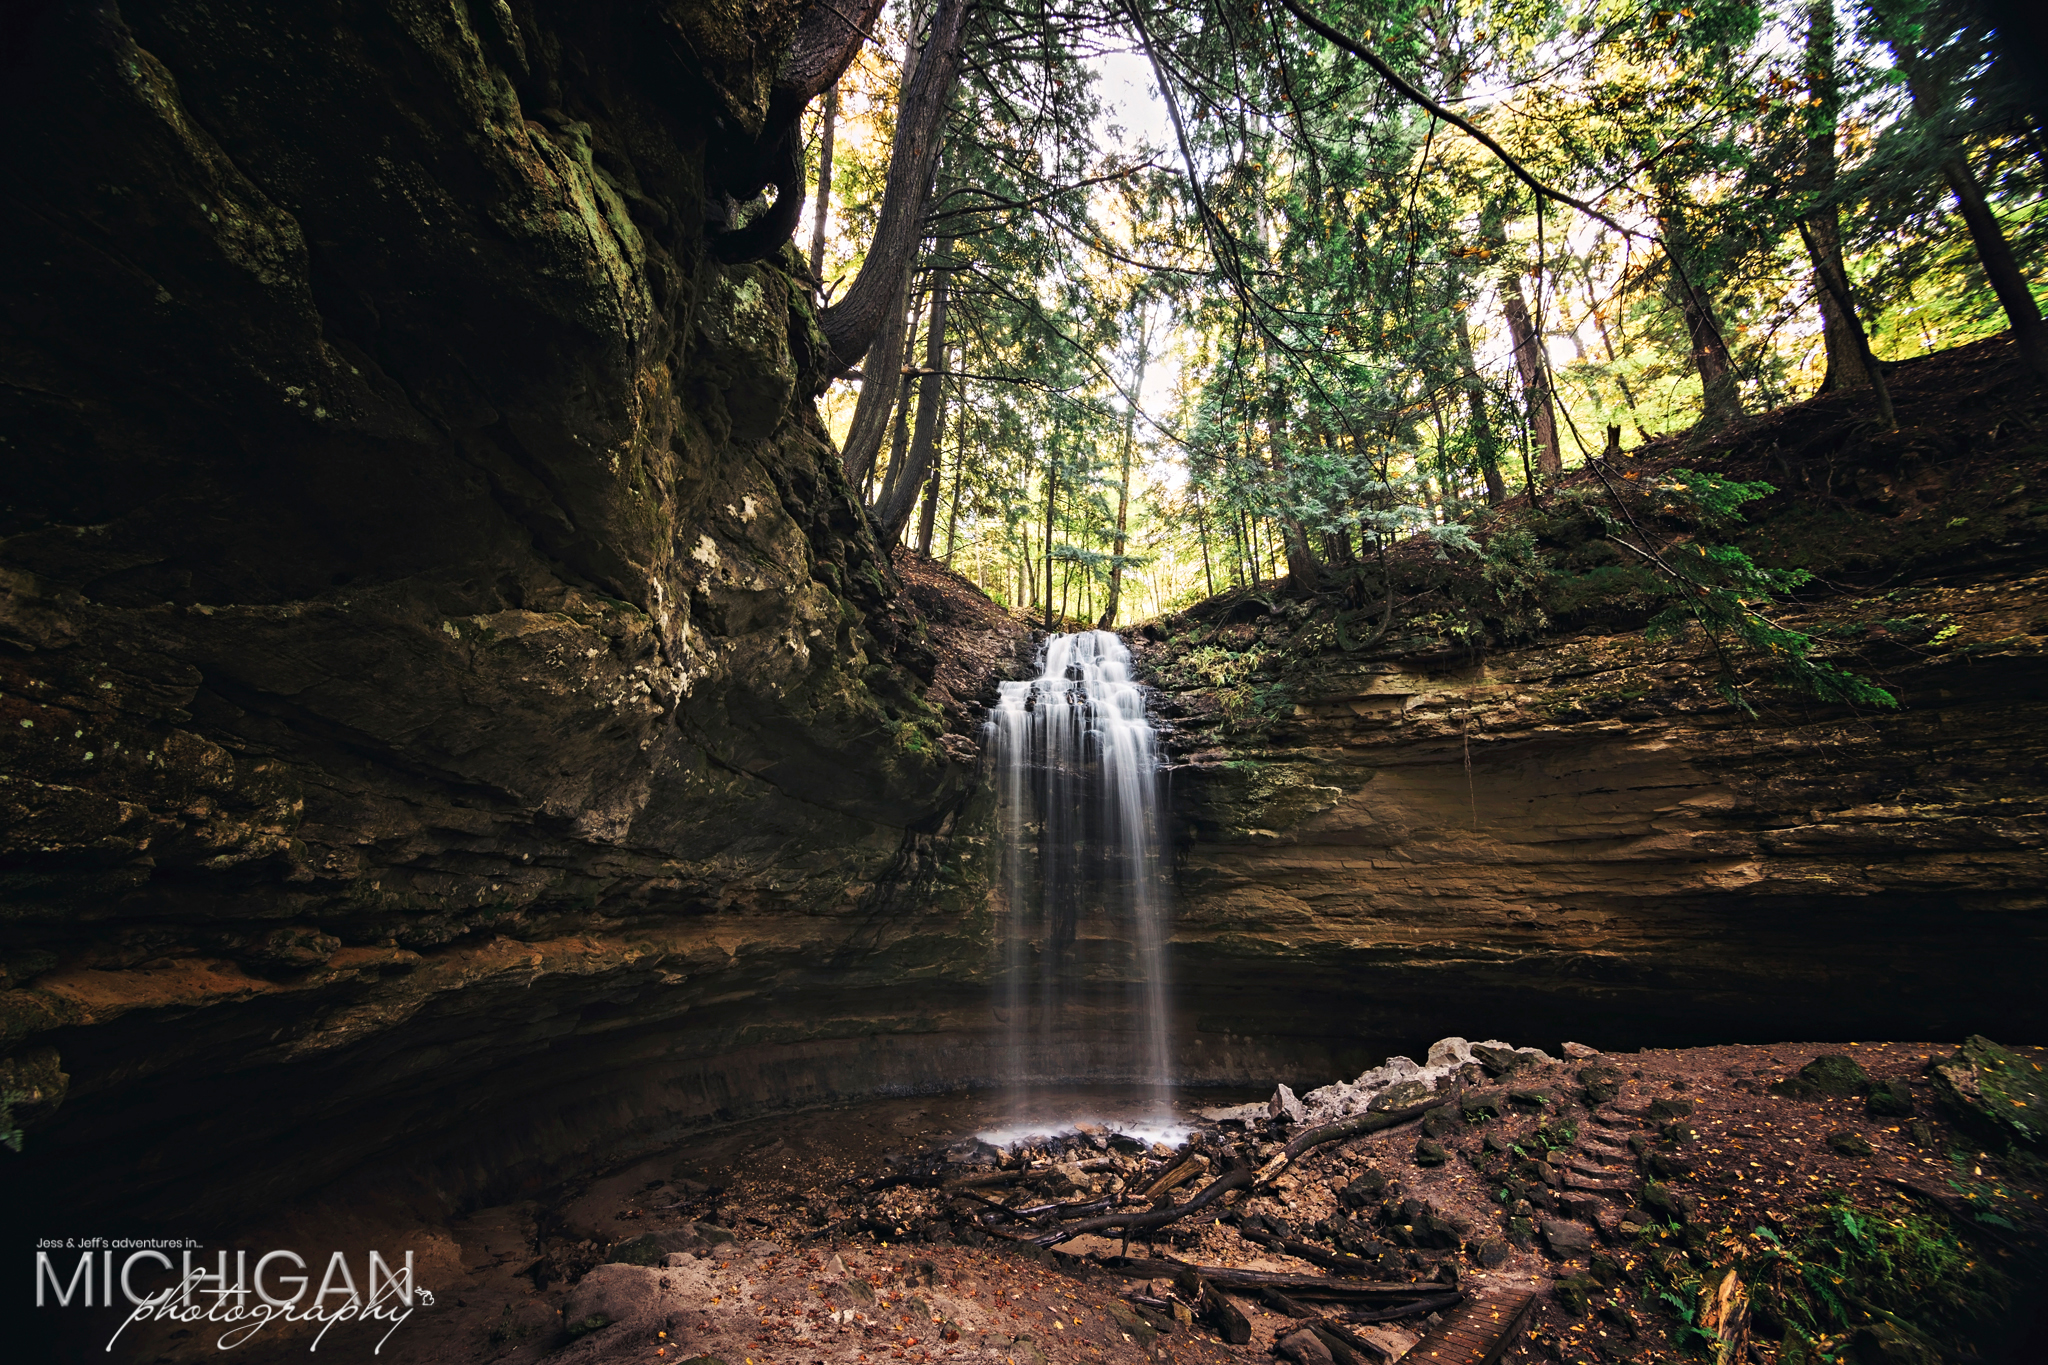 Tannery Falls in Munising Michigan